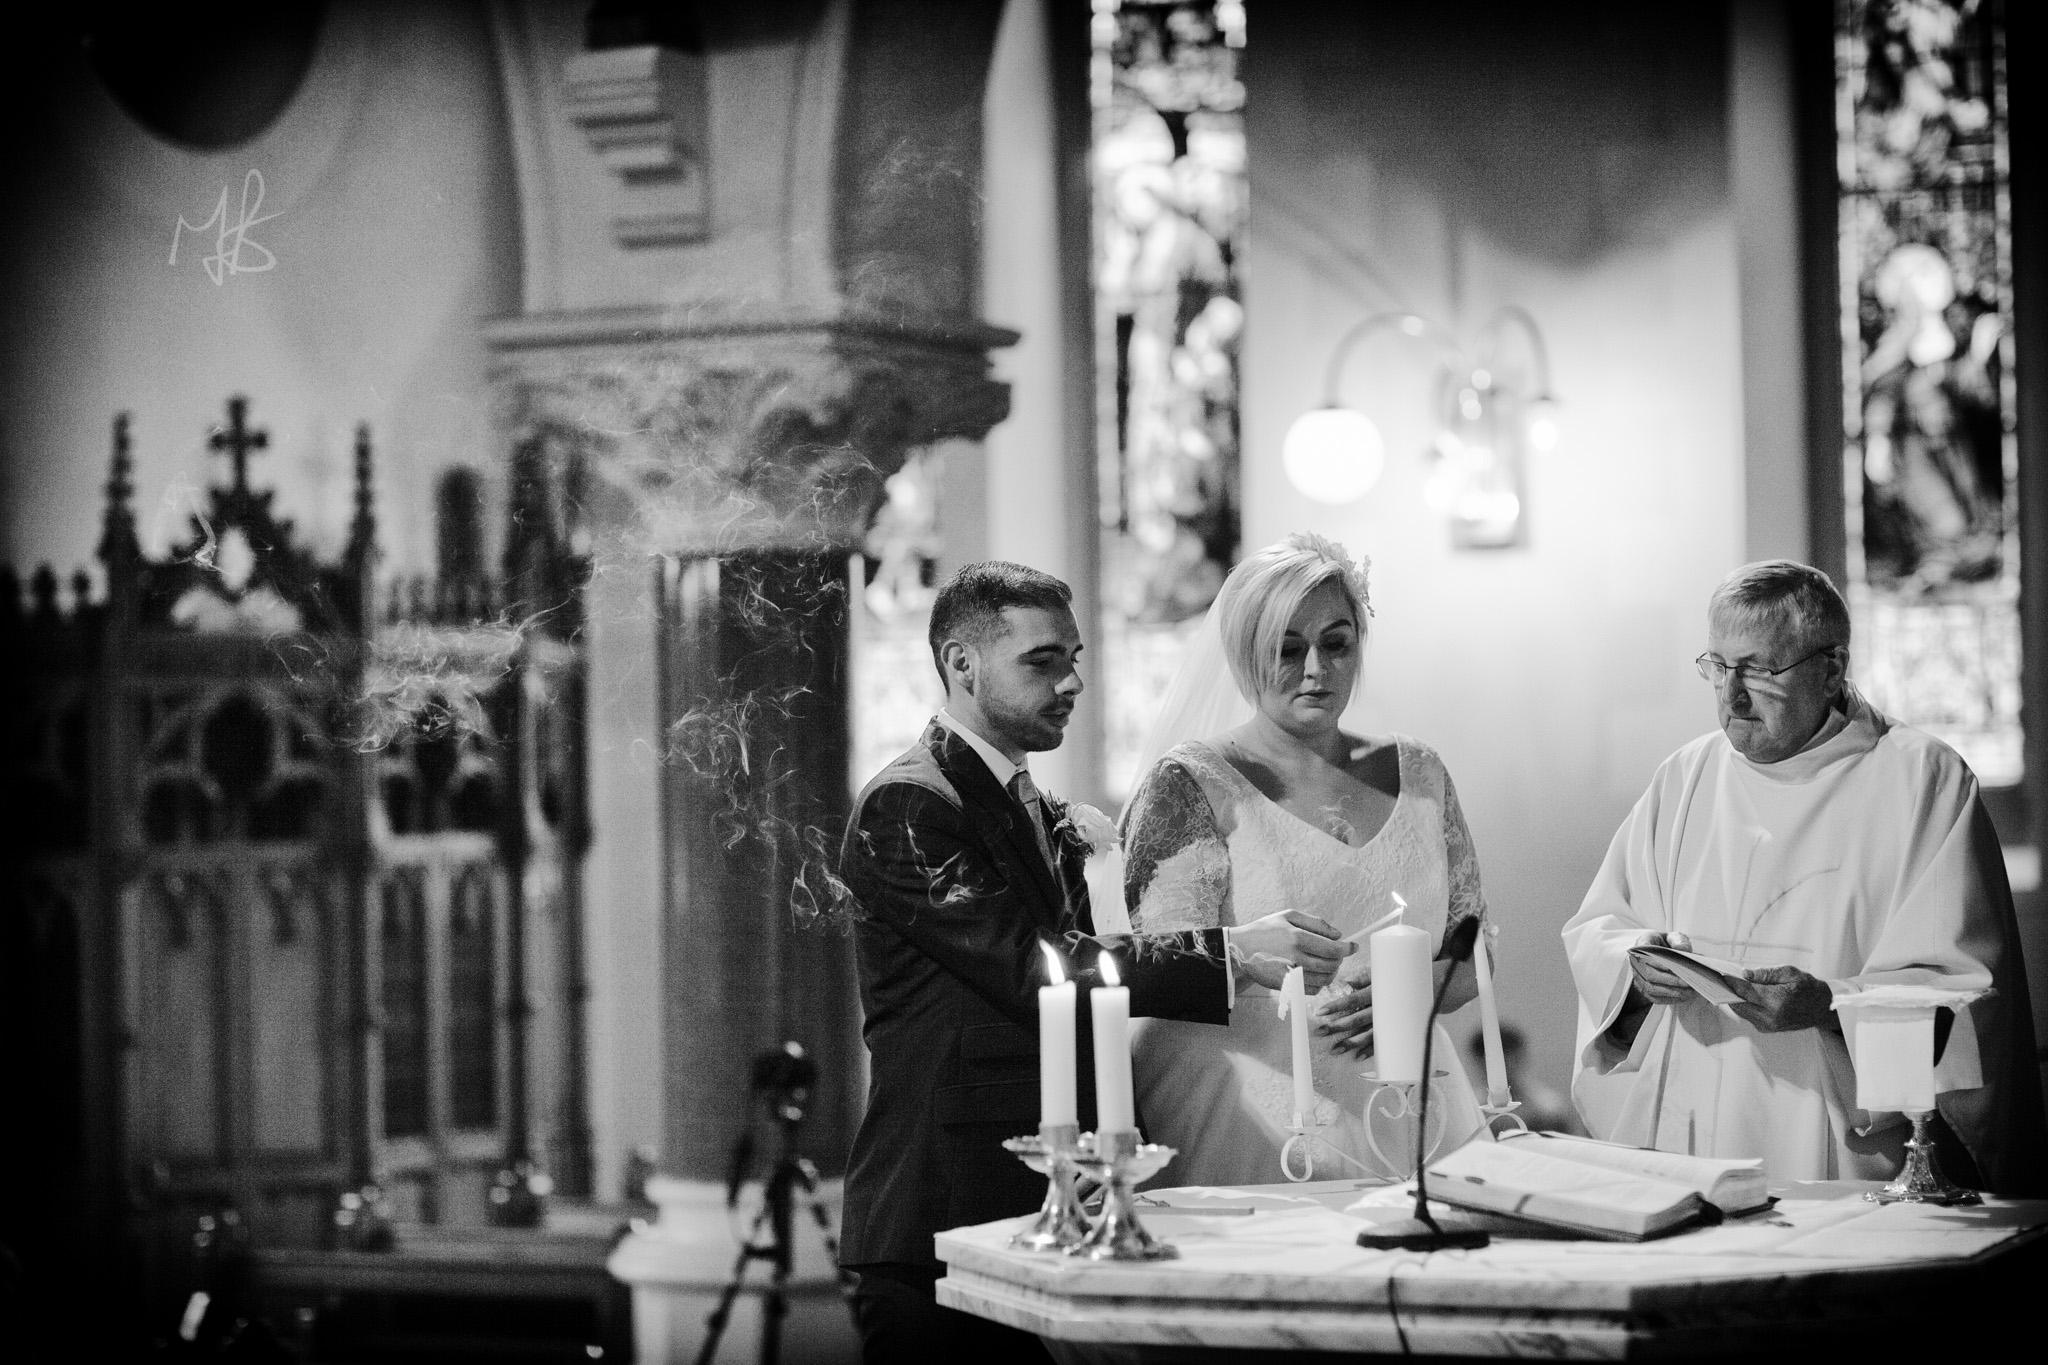 Northern-Ireland-Wedding-Photographer-Mark-Barnes-Ballymena_wedding-photography-Leighinmohr-House-Seamas_Alanna_For-web-21.jpg